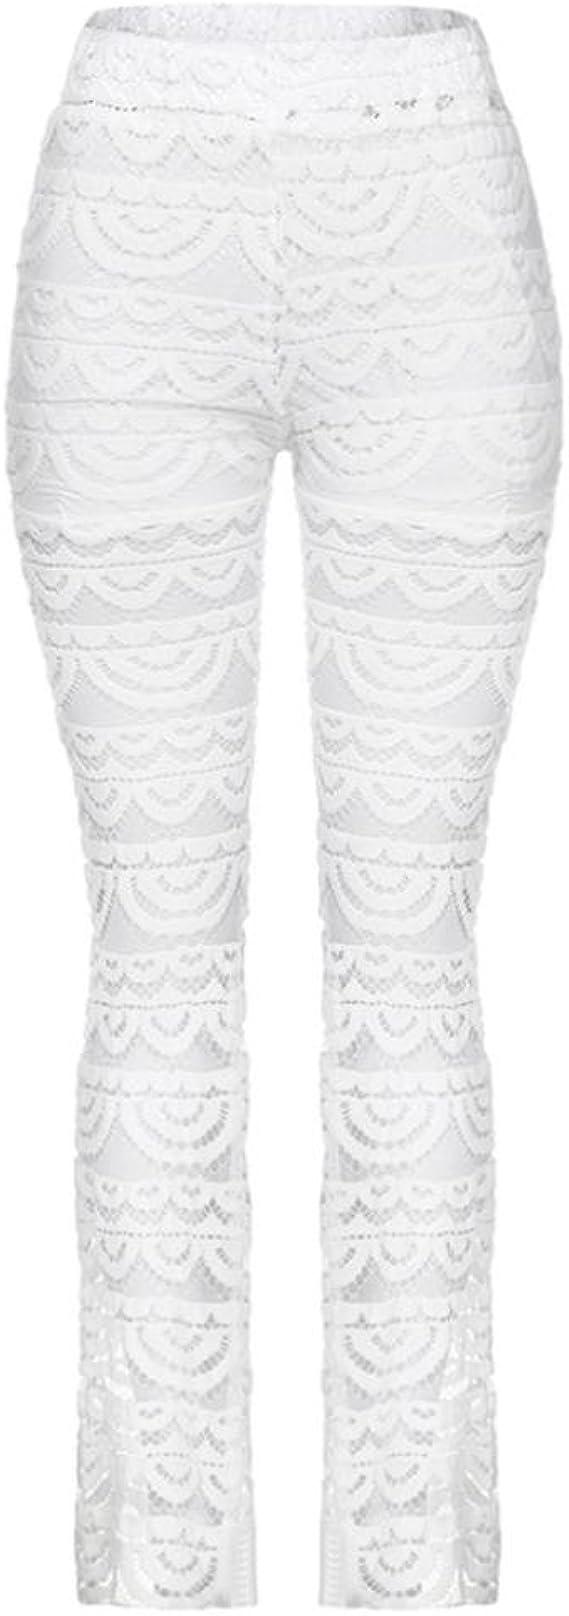 ترديد ضجة واحه Negro Paolian Pantalones De Mujer Verano 2018 Pantalones De Vestir Encaje Palazzo Cintura Alta Pantalones Perspectiva Analogdevelopment Com